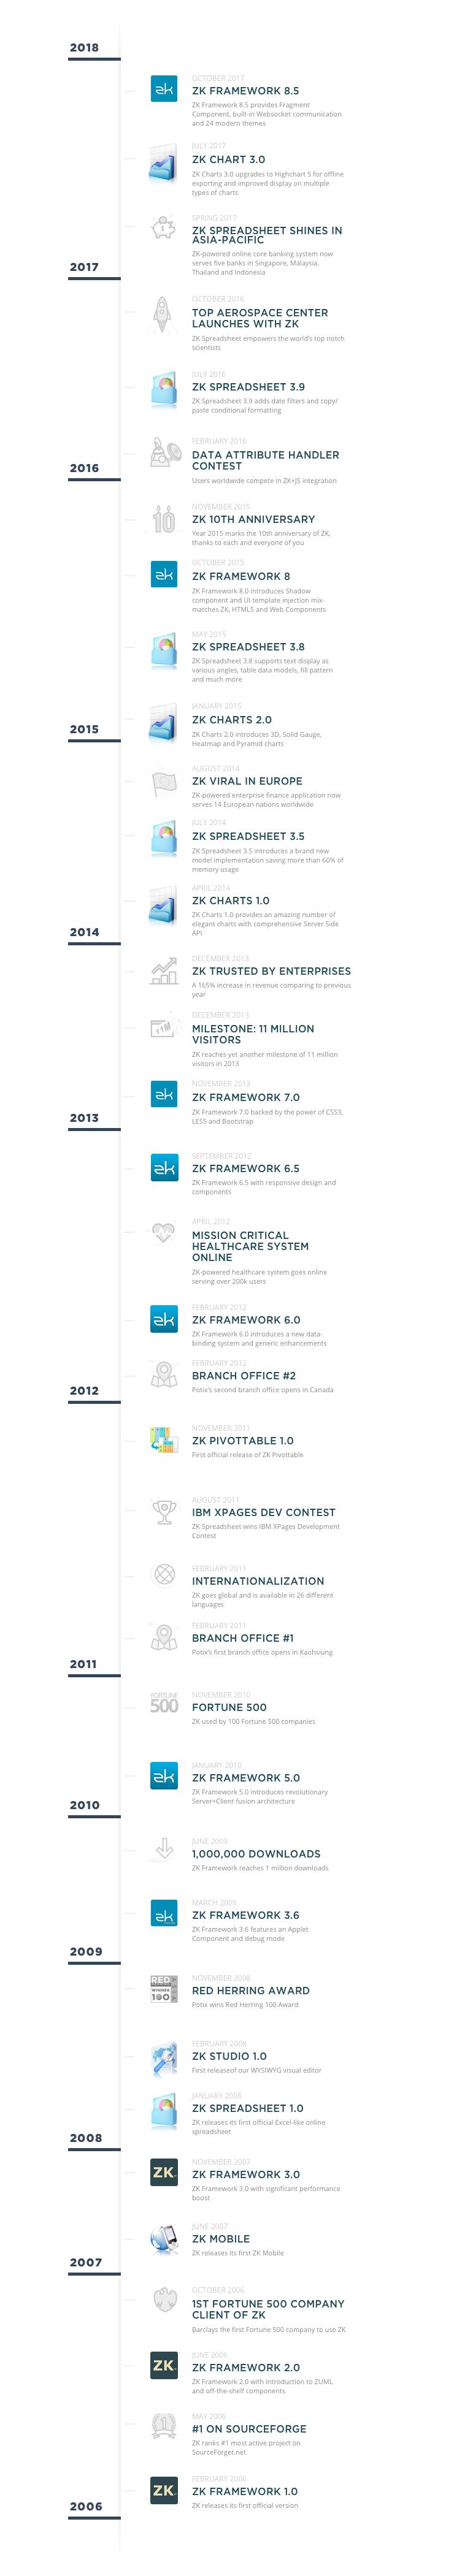 ZK Timeline